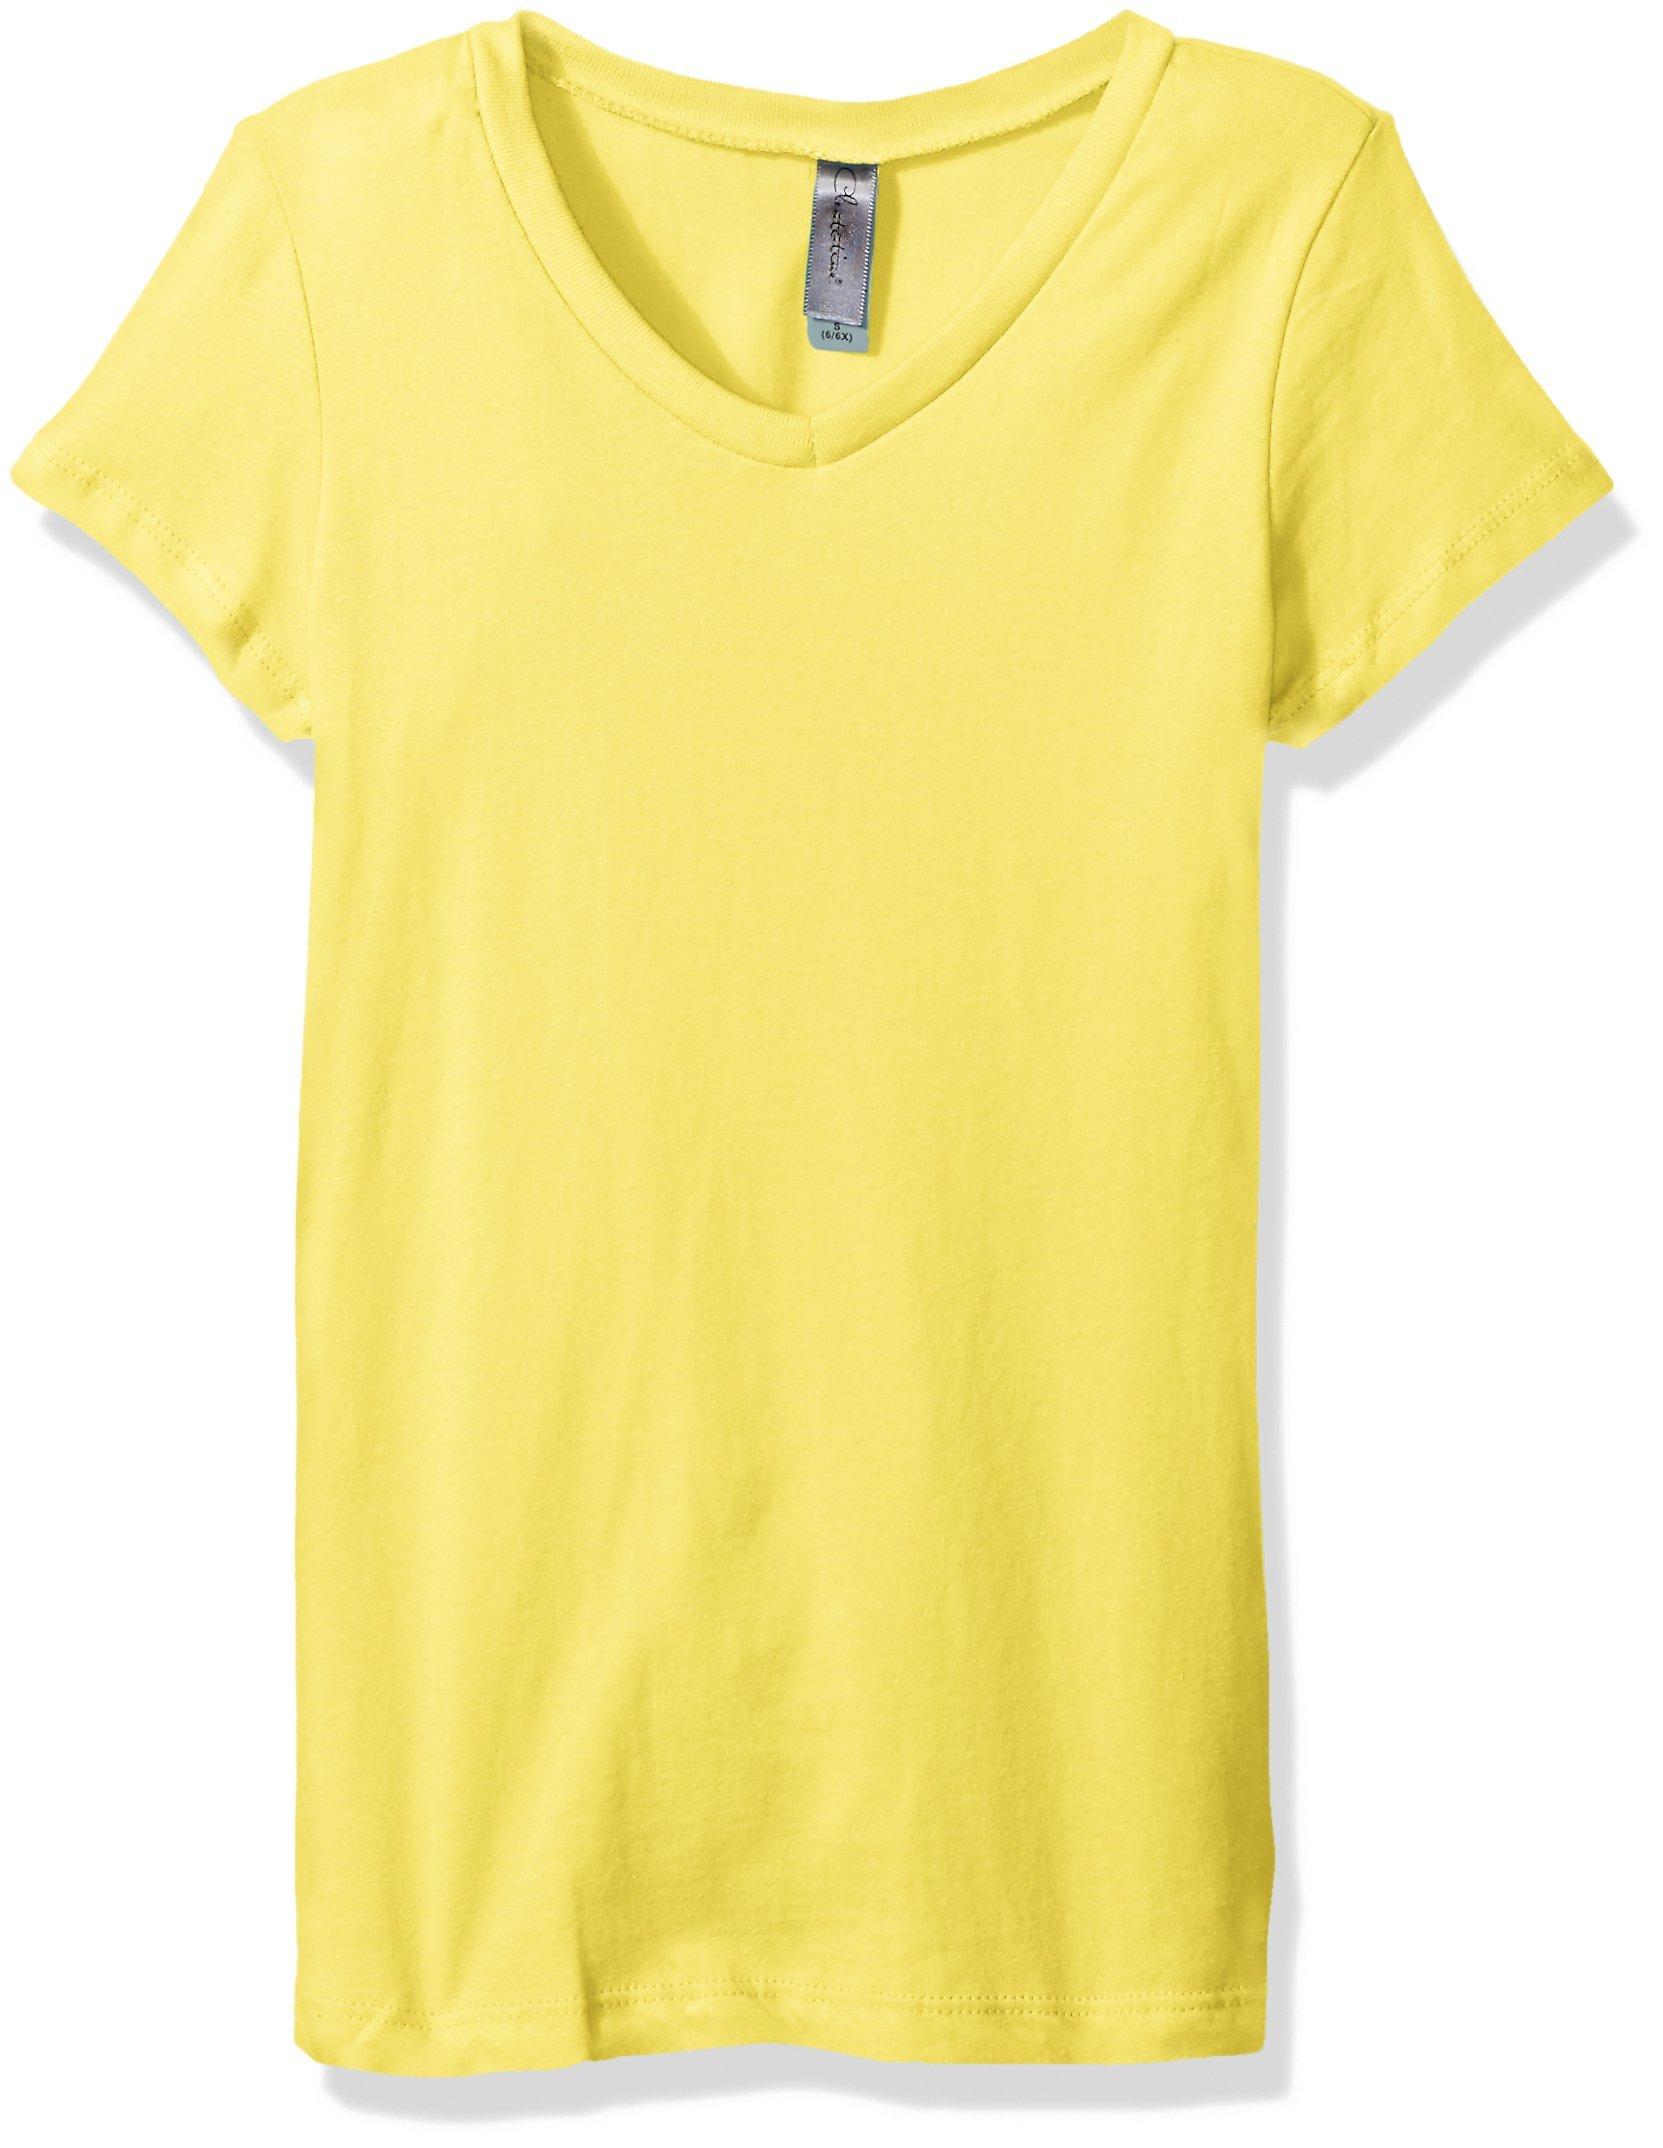 Clementine Apparel Big Girls' Everyday Short-Sleeve Princess V-Neck Tee, Yellow, Large